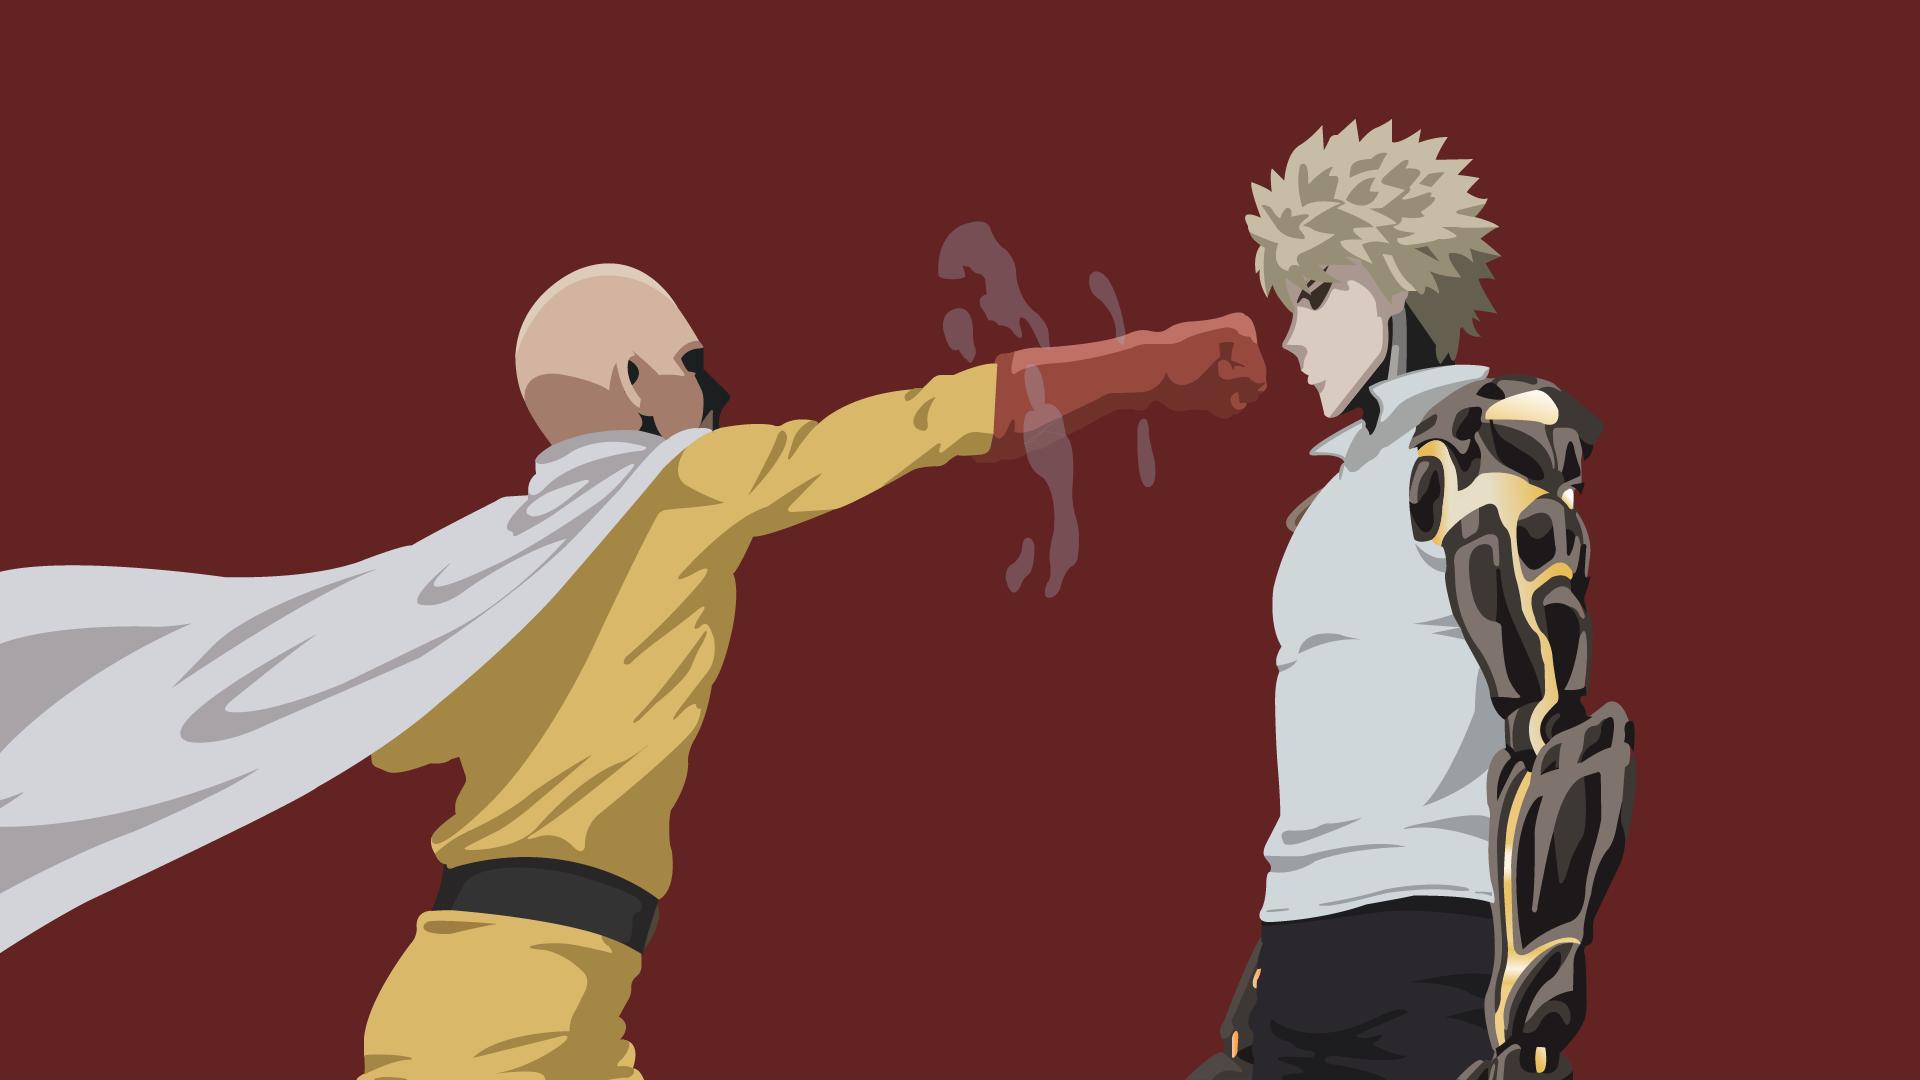 Good Wallpaper Android One Punch Man - illustration-anime-artwork-cartoon-Saitama-One-Punch-Man-Genos-screenshot-40637  Best Photo Reference_6389      .png